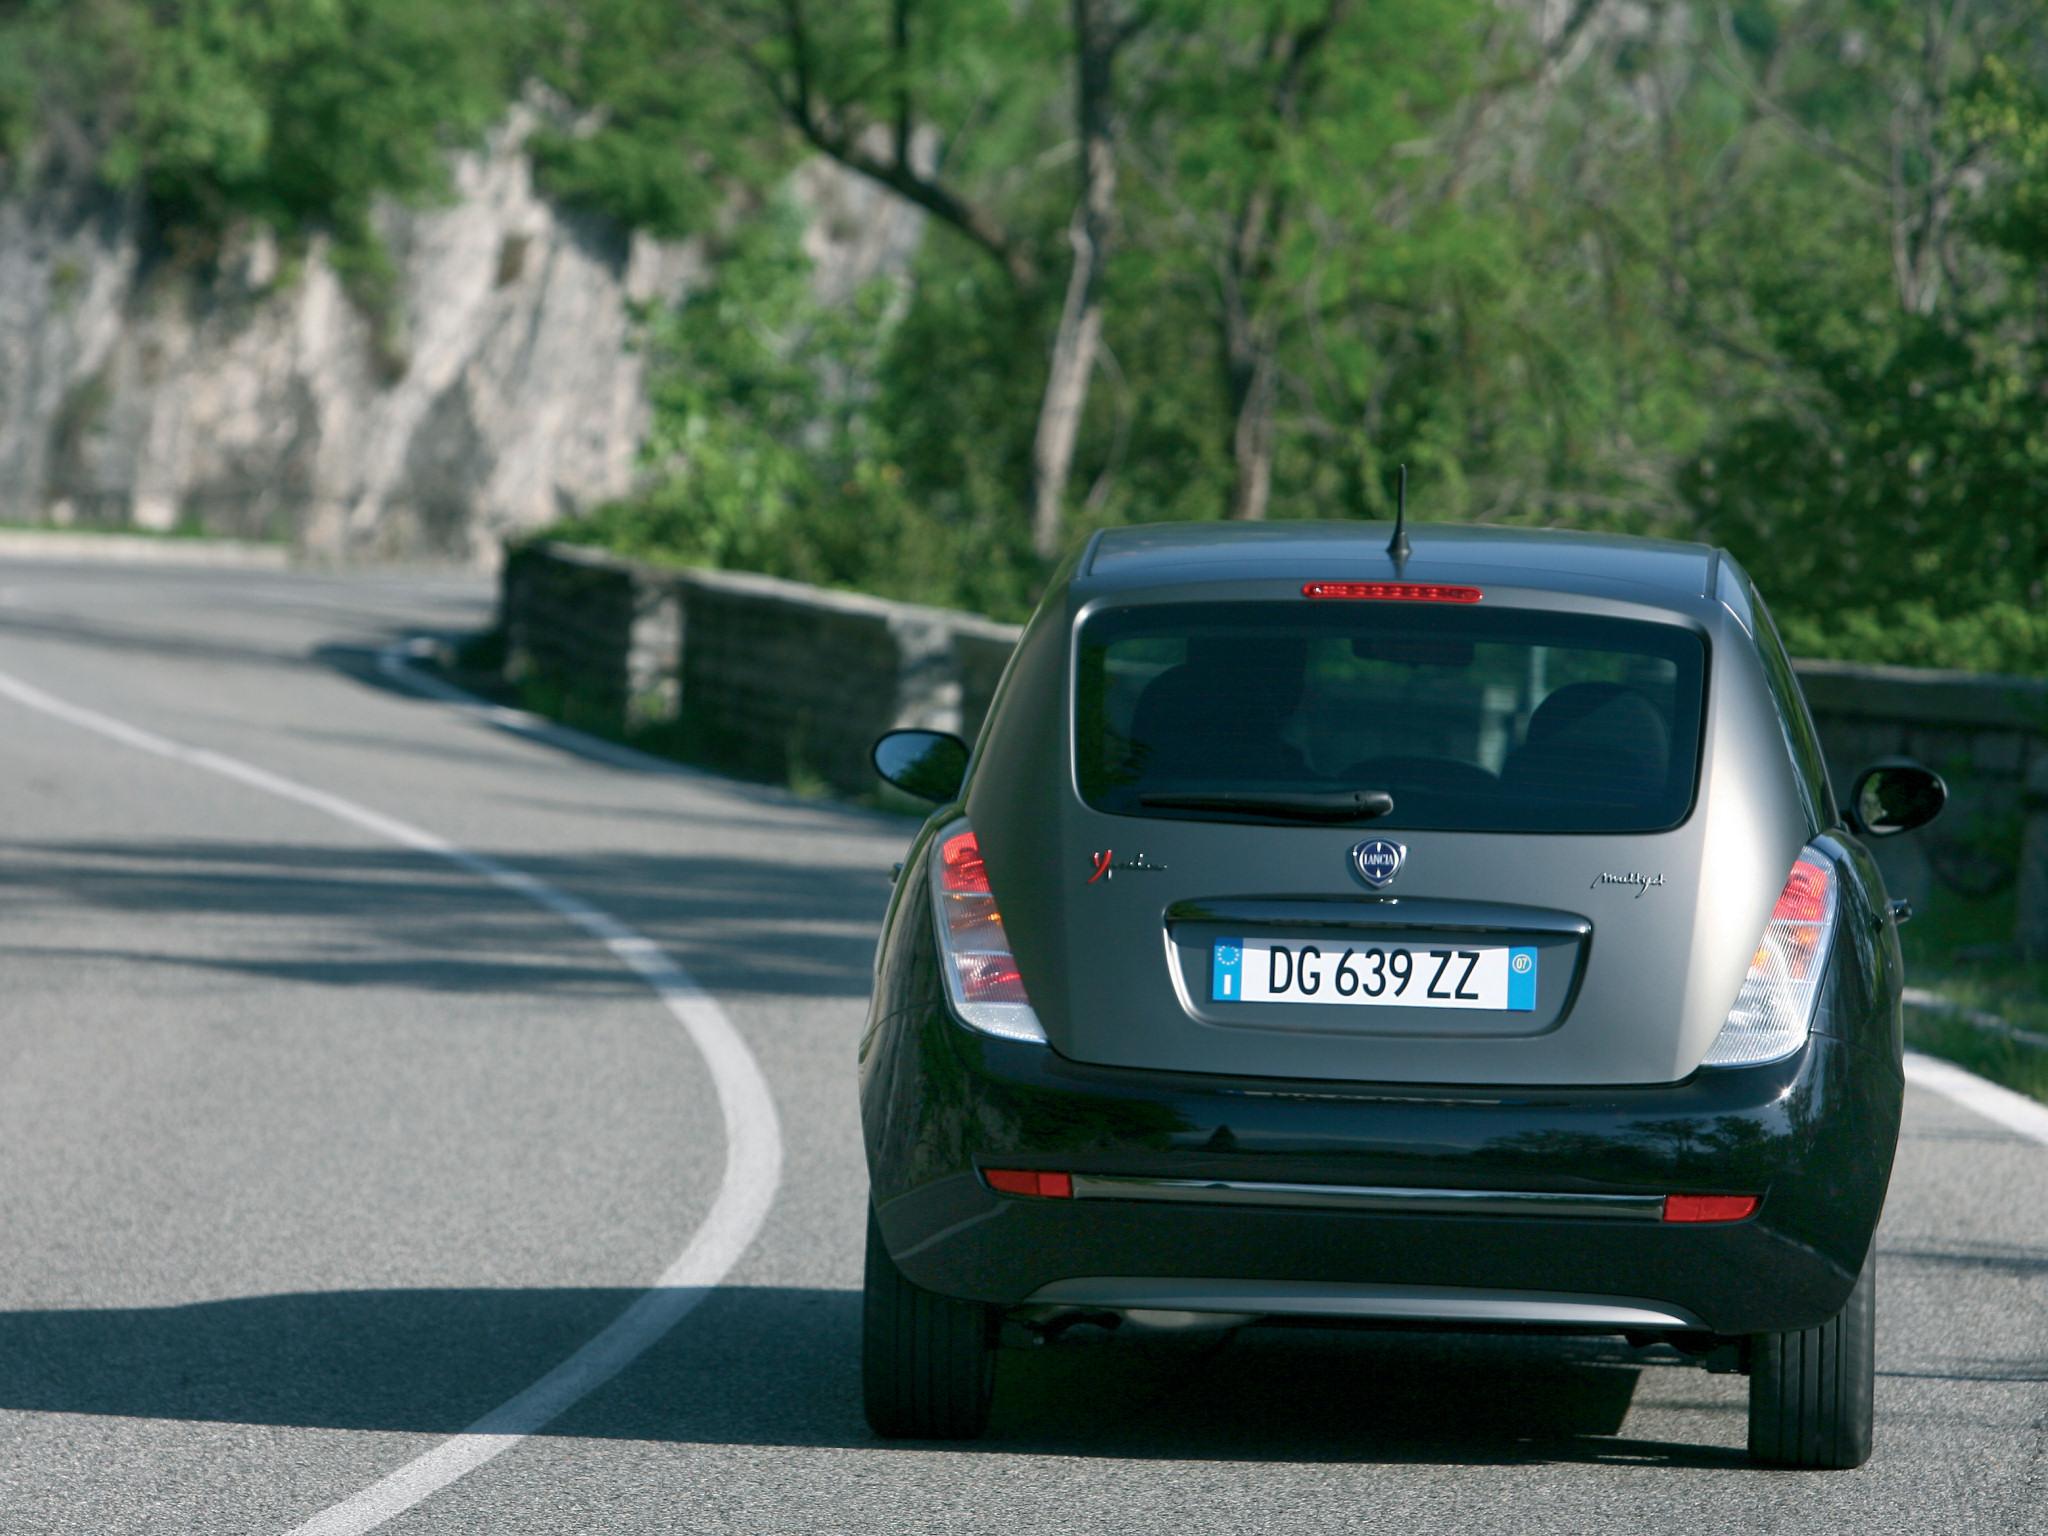 http://carinpicture.com/wp-content/uploads/2012/07/Lancia-Ypsilon-Sport-MOMO-Design-2007-Photo-08.jpg